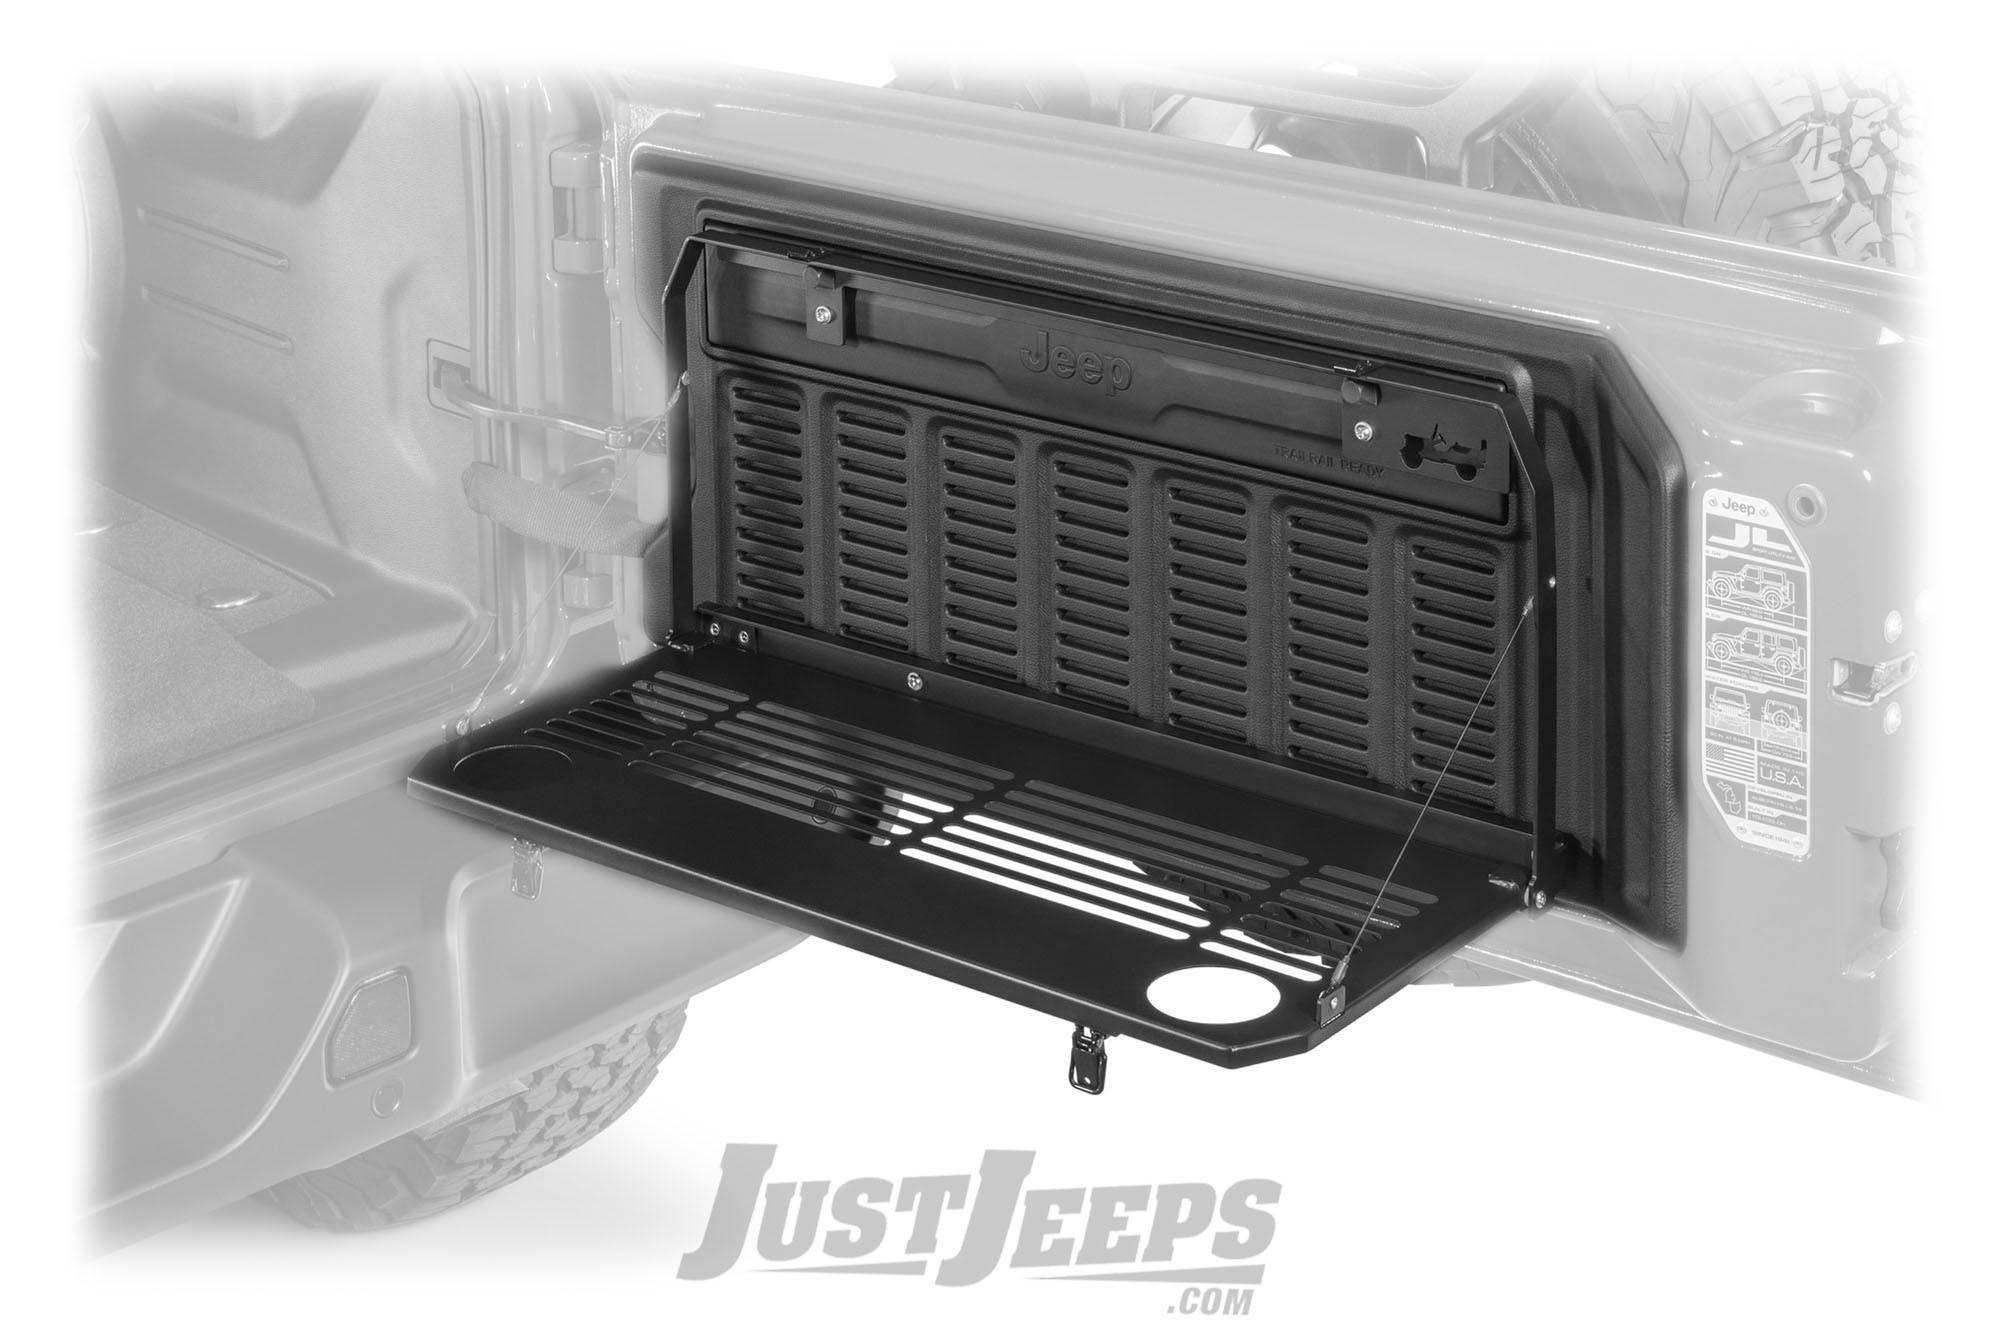 Just Jeeps Mopar Tailgate Table For 2018 Jeep Wrangler Jl